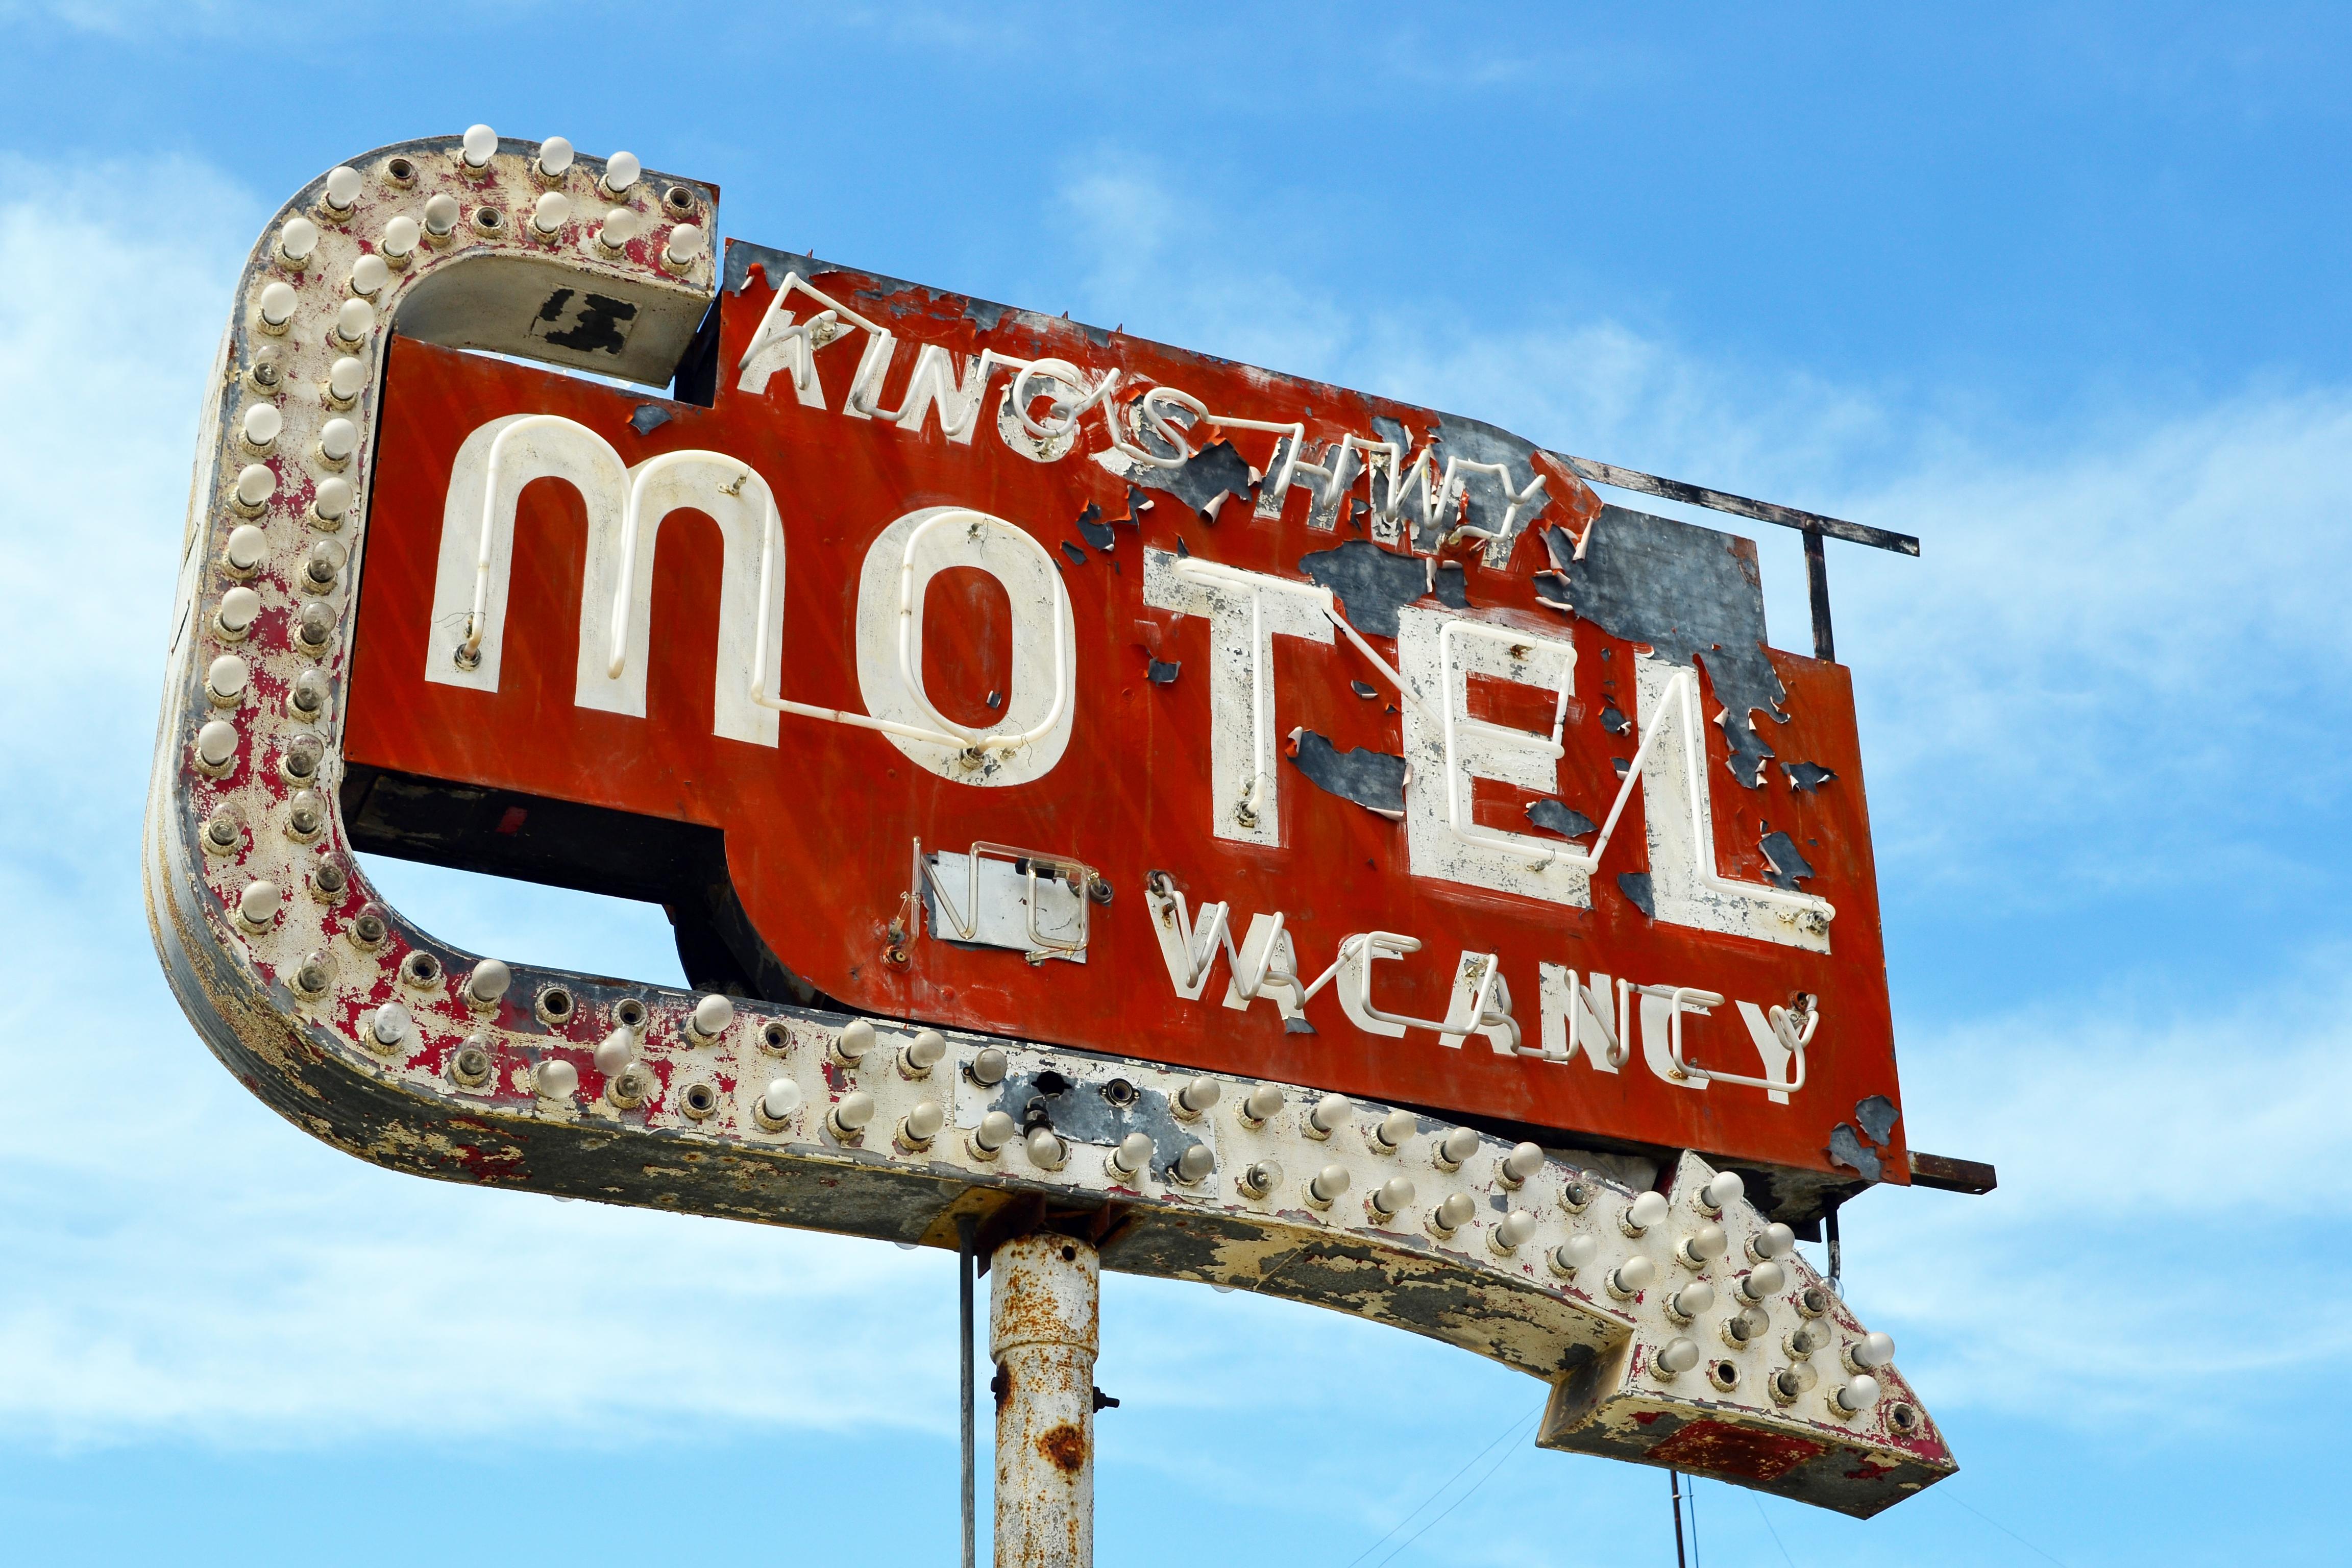 King's Highway Motel - 1031 El Camino Real, Santa Clara, California U.S.A. - April 17, 2014